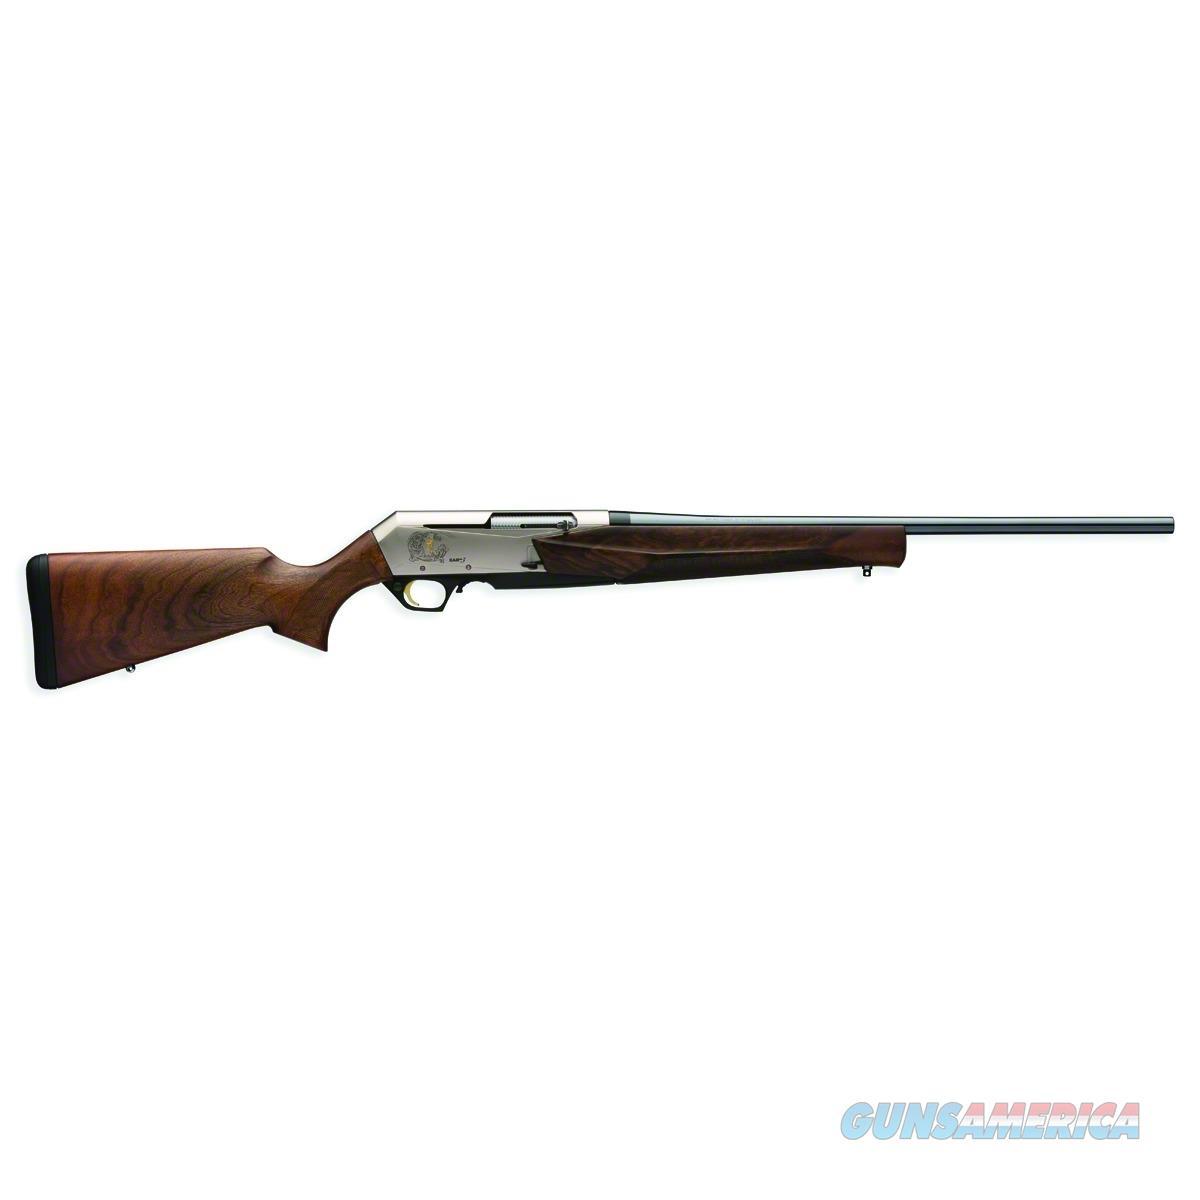 "Browning Bar Mark Iii Semi-Auto Rifle 243 Win 22"" Wood Stock 5Rd 031047211  Guns > Rifles > B Misc Rifles"